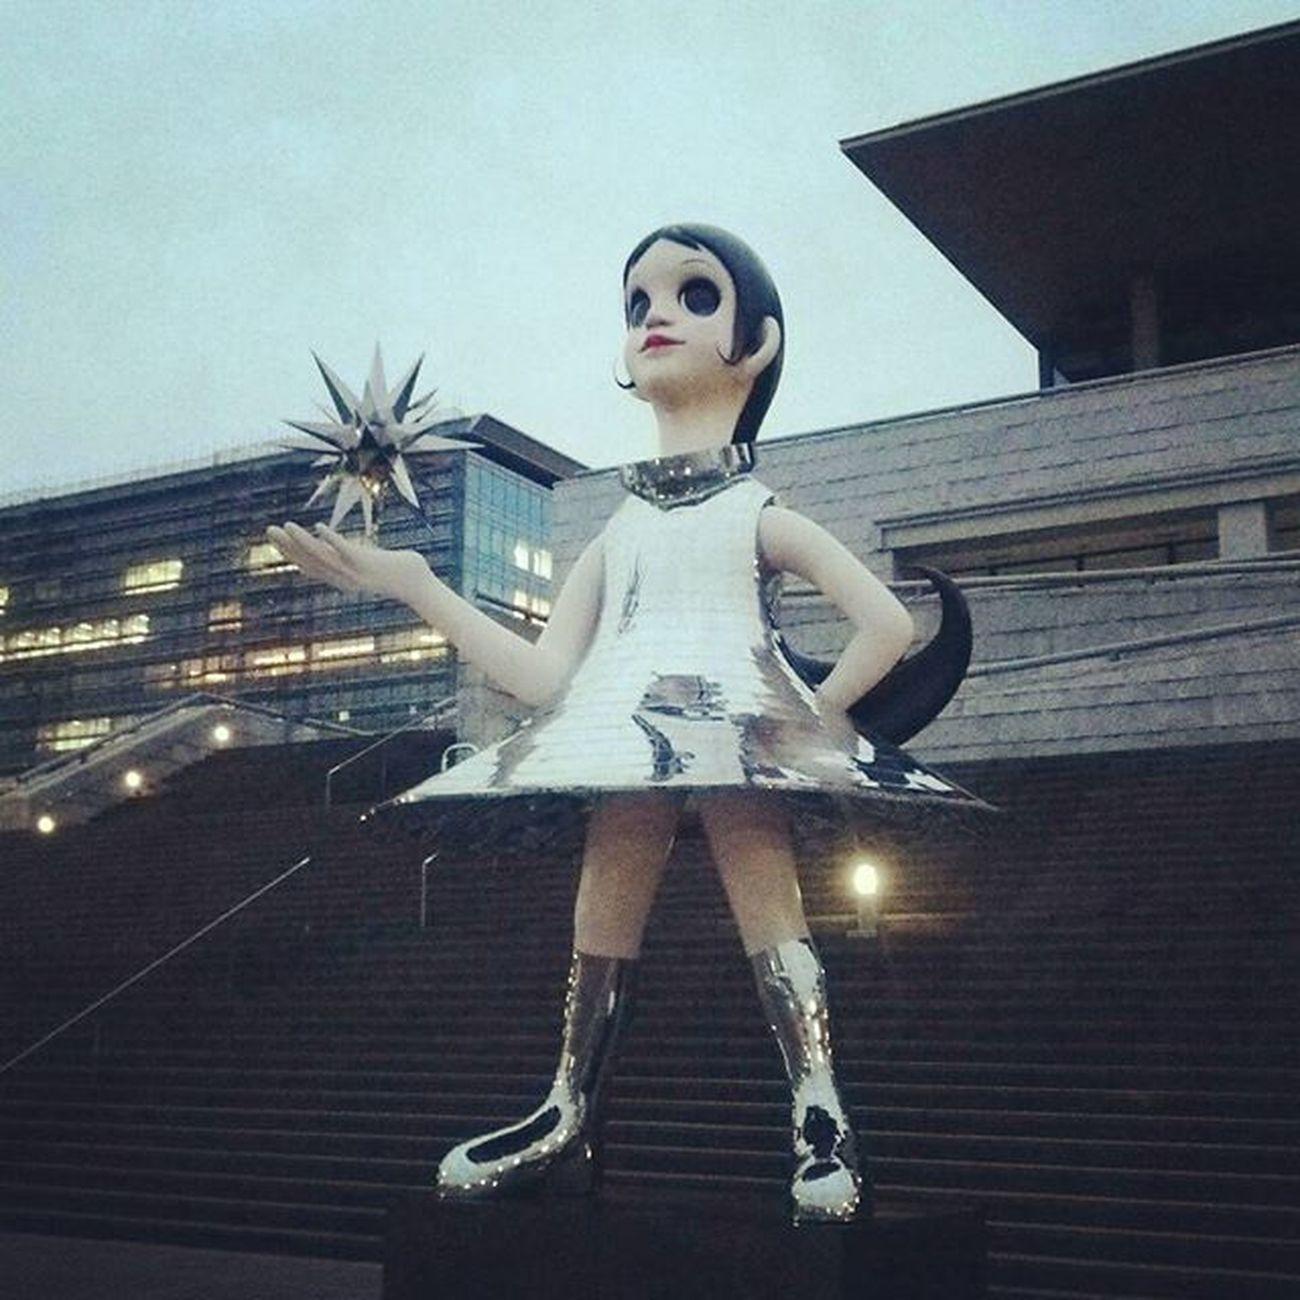 SunSister 兵庫県立美術館 Sun_Sister なぎさ ヤノベケンジ 過去現在未来を見つめる少女像 阪神大震災復興 希望の象徴 Monument Japan